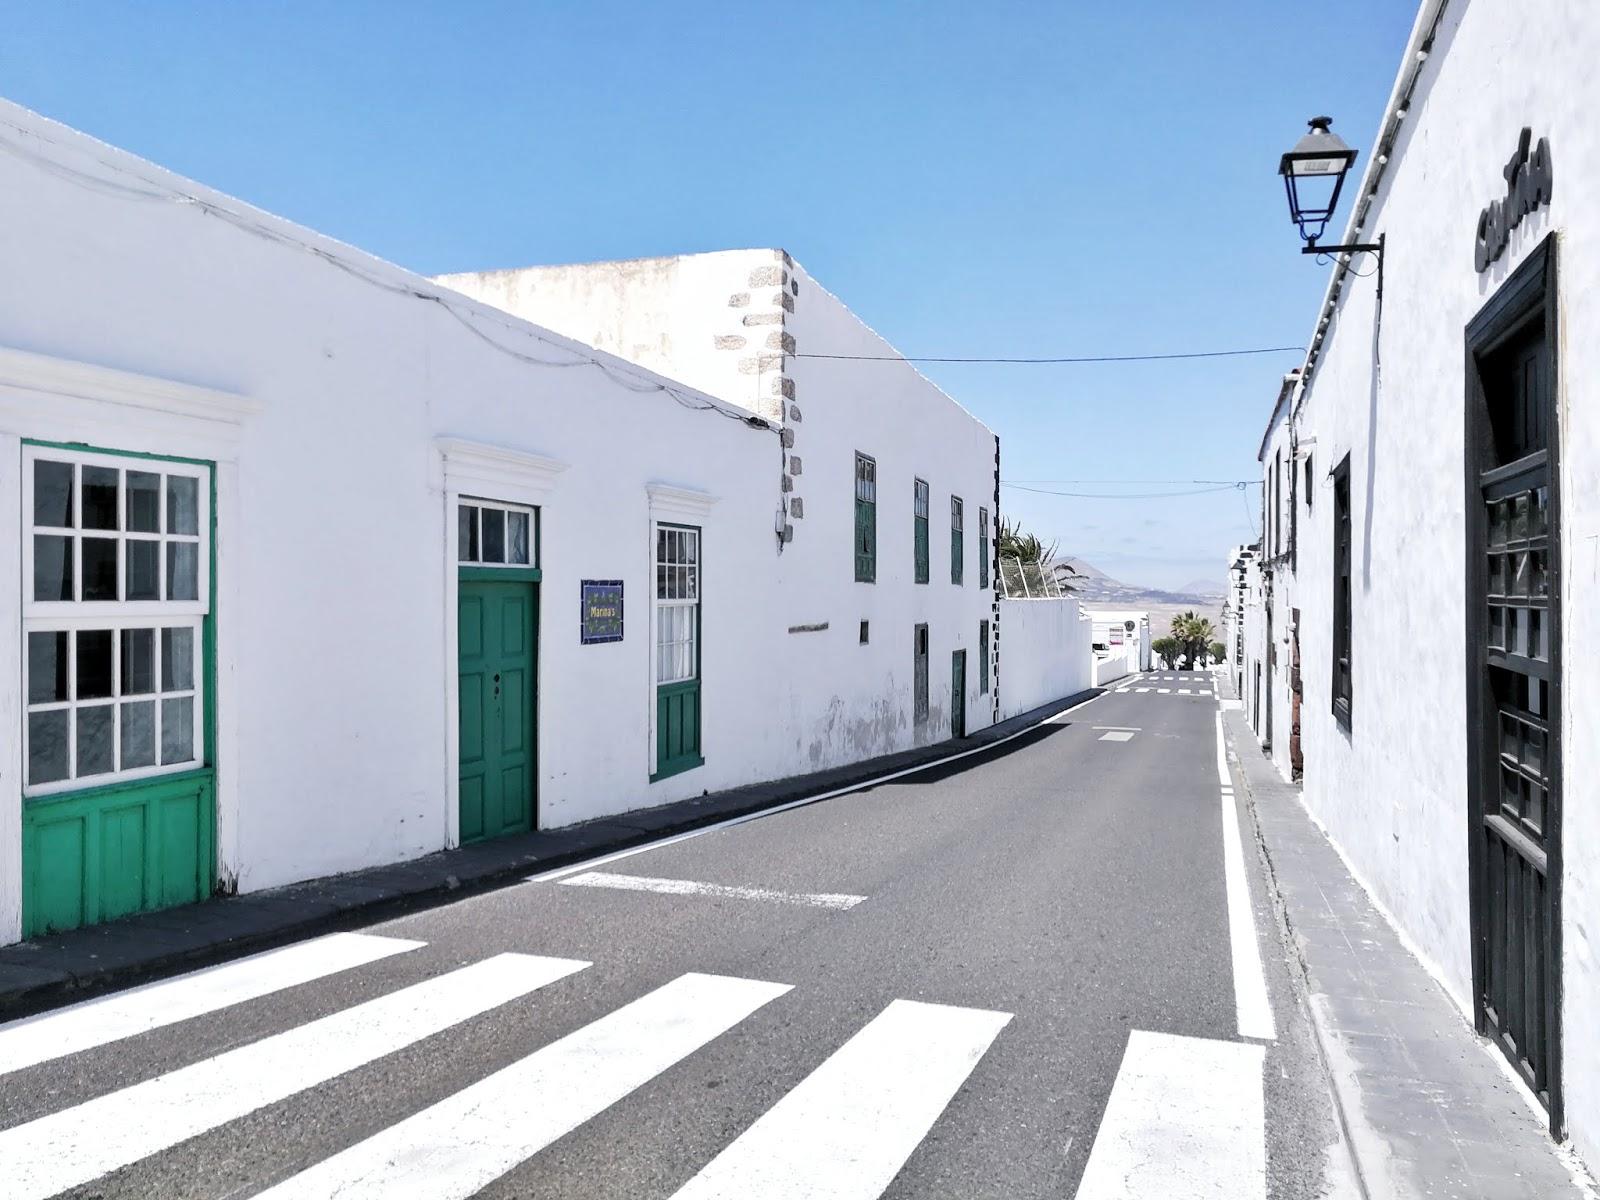 Lanzarote, Canary Islands, Kanariansaaret, Cesar Manrique